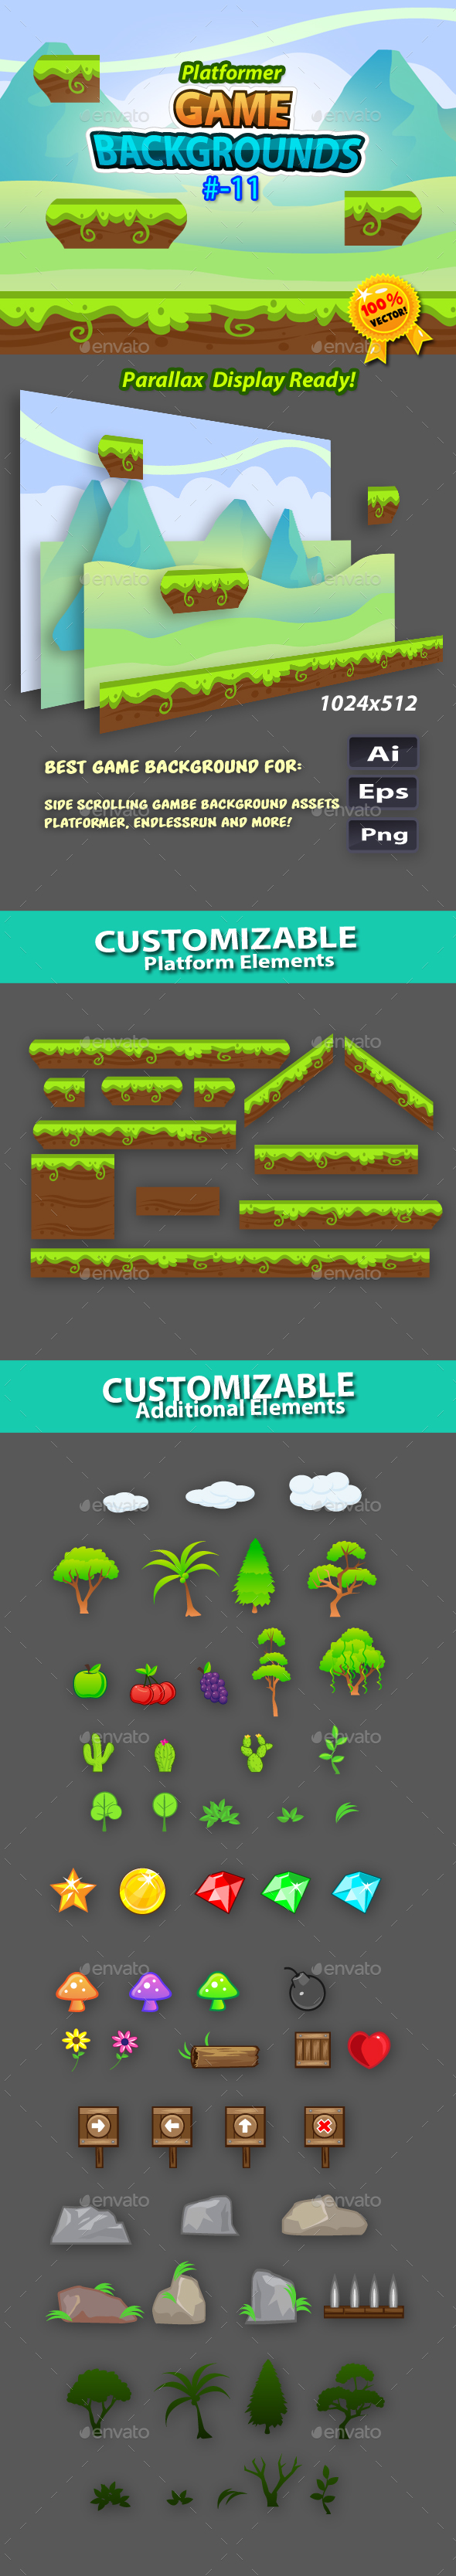 Plaftormer Game Backgrounds11 - Backgrounds Game Assets